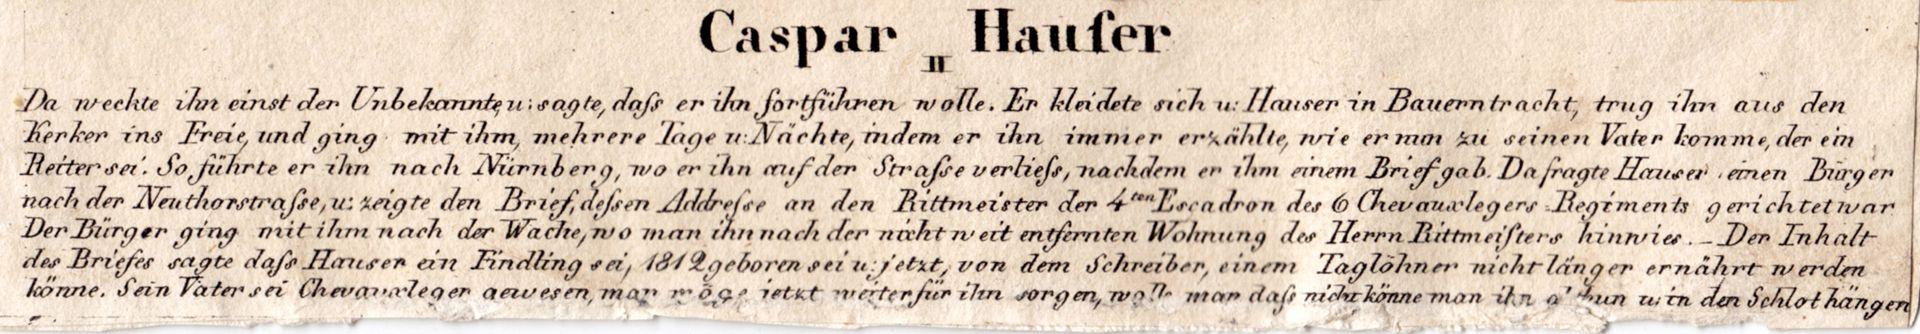 Caspar Hauser  II Bildunterschrift